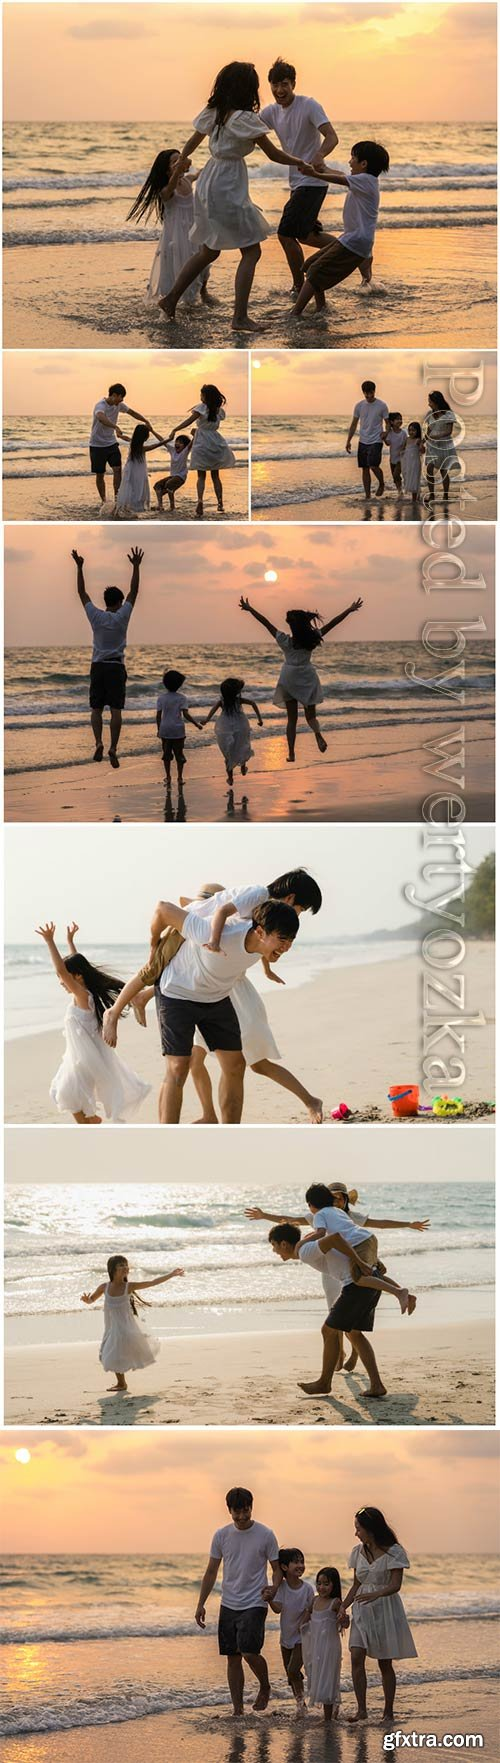 Happy family enjoy vacation on beach in evening